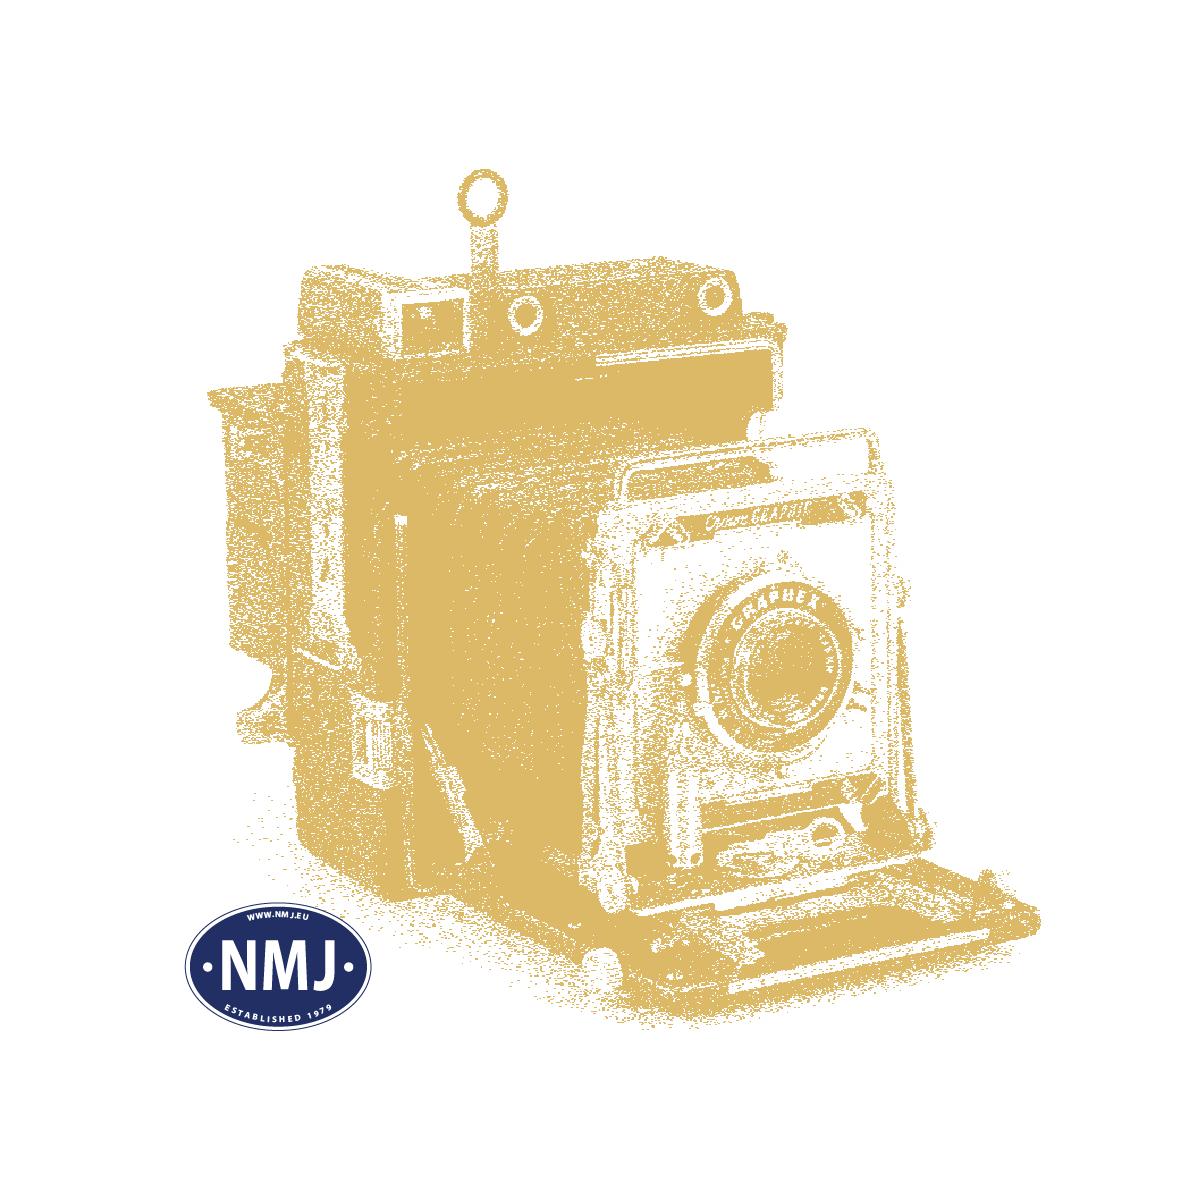 NMJT90016 - NMJ Topline NSB Di3a 618, Red/Black Livery, DC